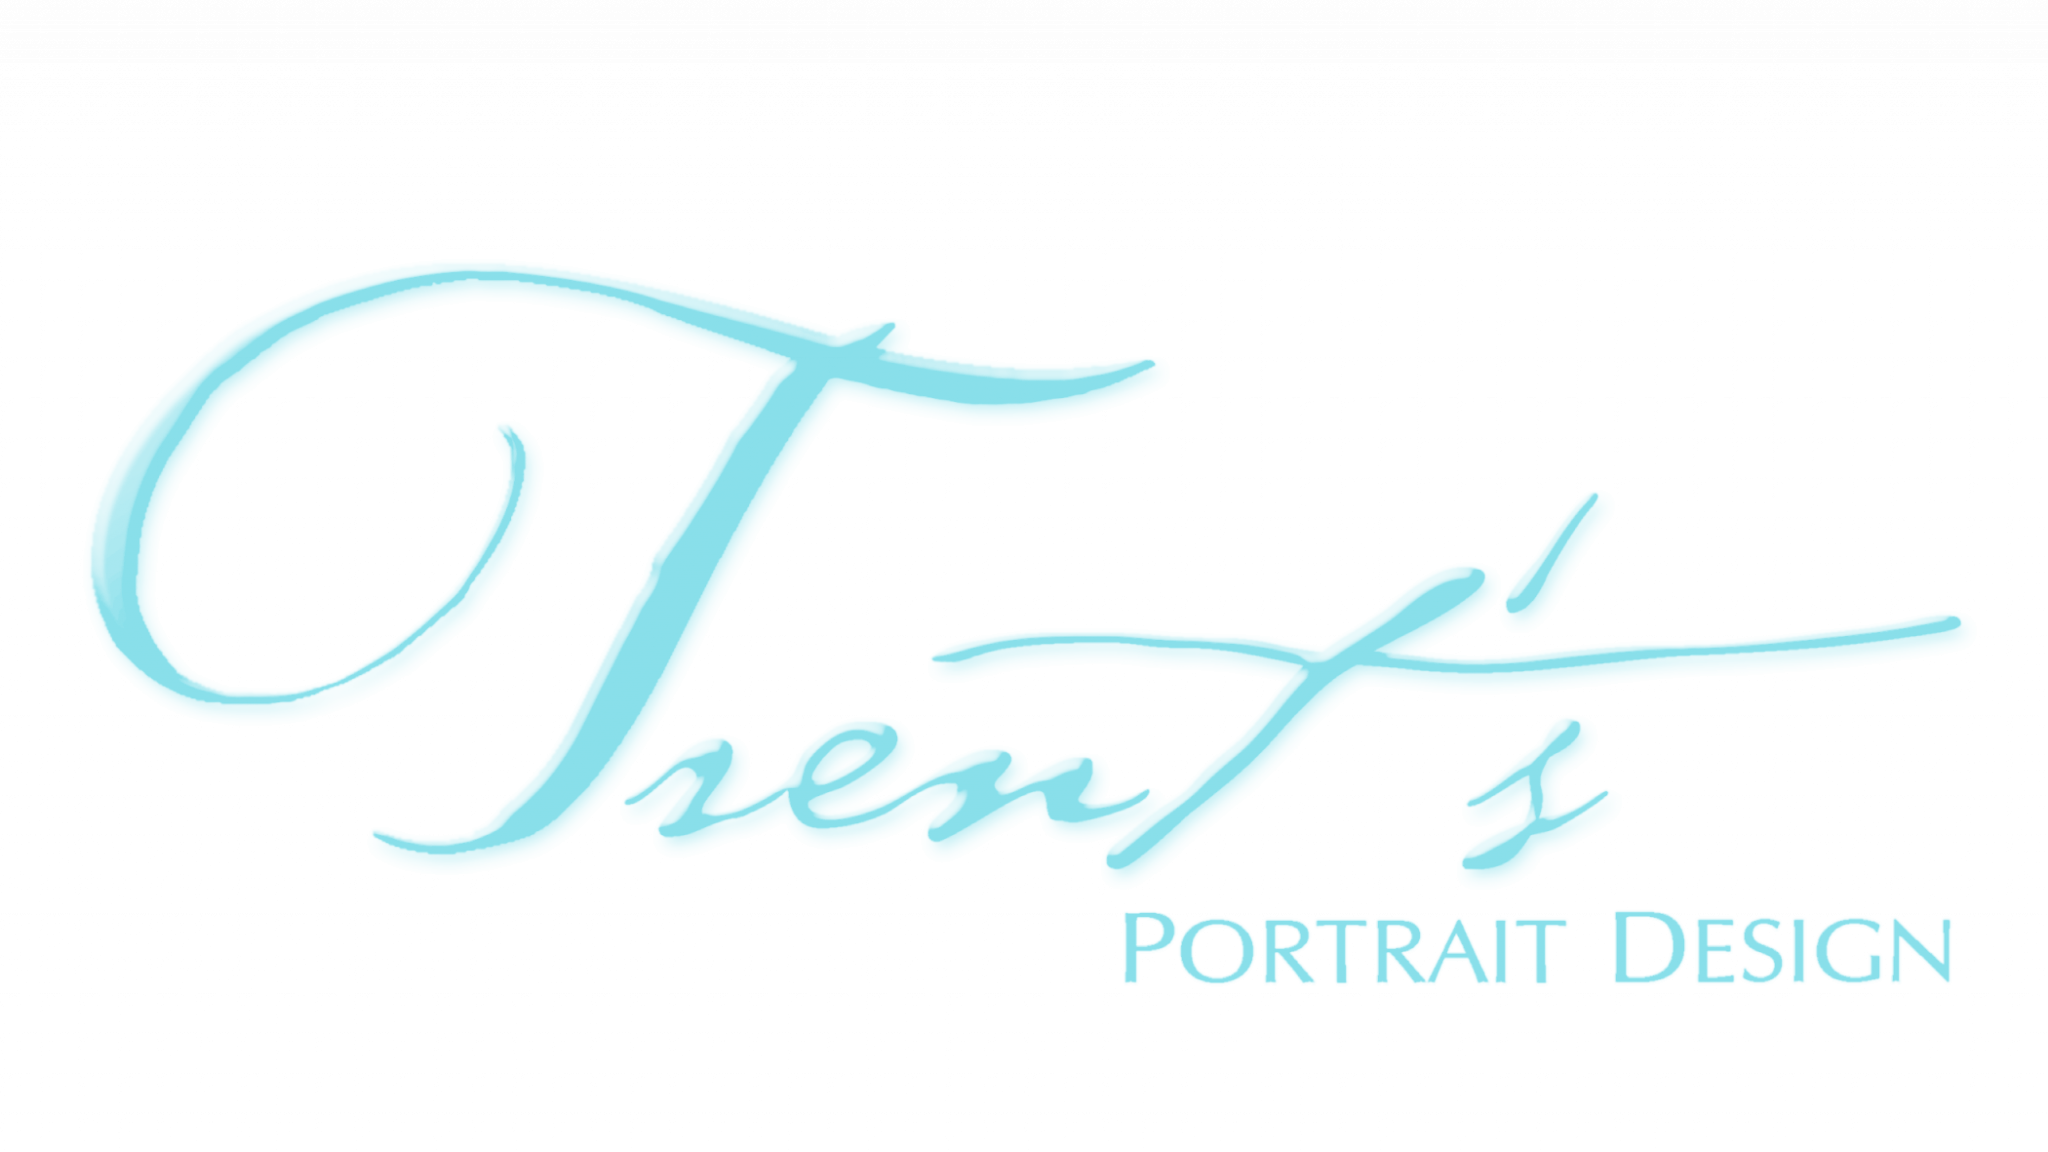 Contact Trent